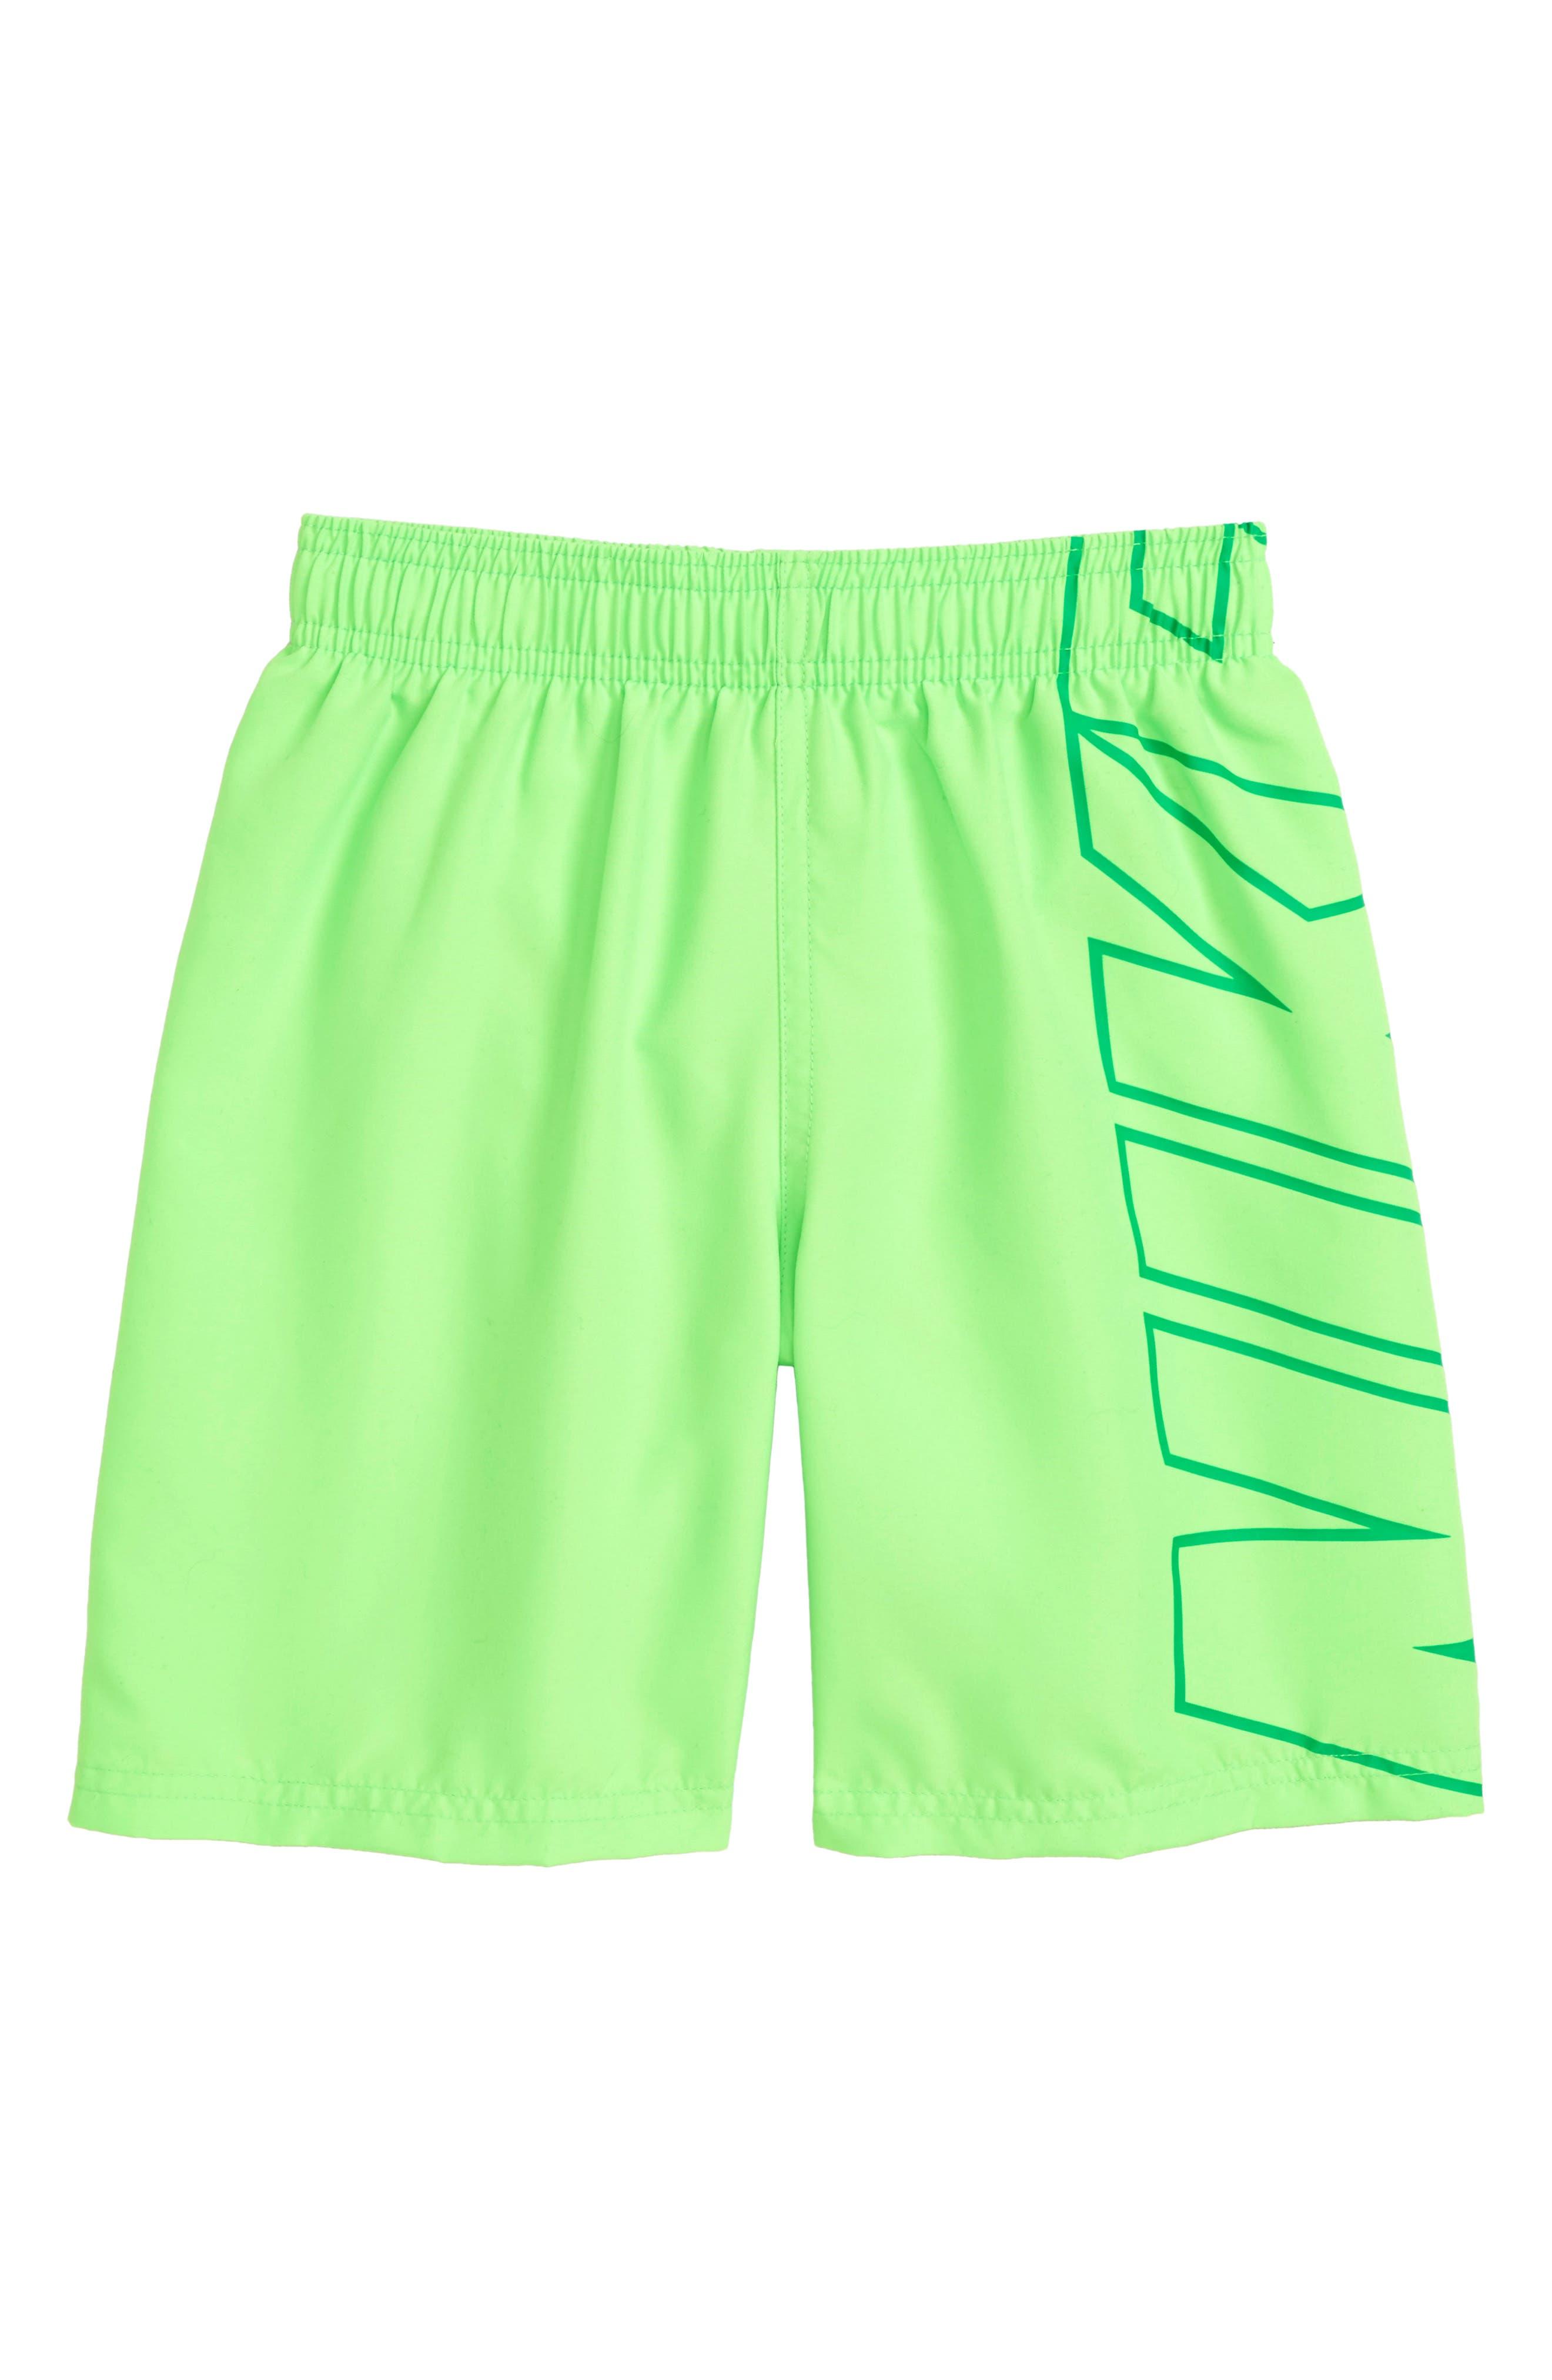 Breaker Board Shorts,                             Main thumbnail 1, color,                             Green Strike